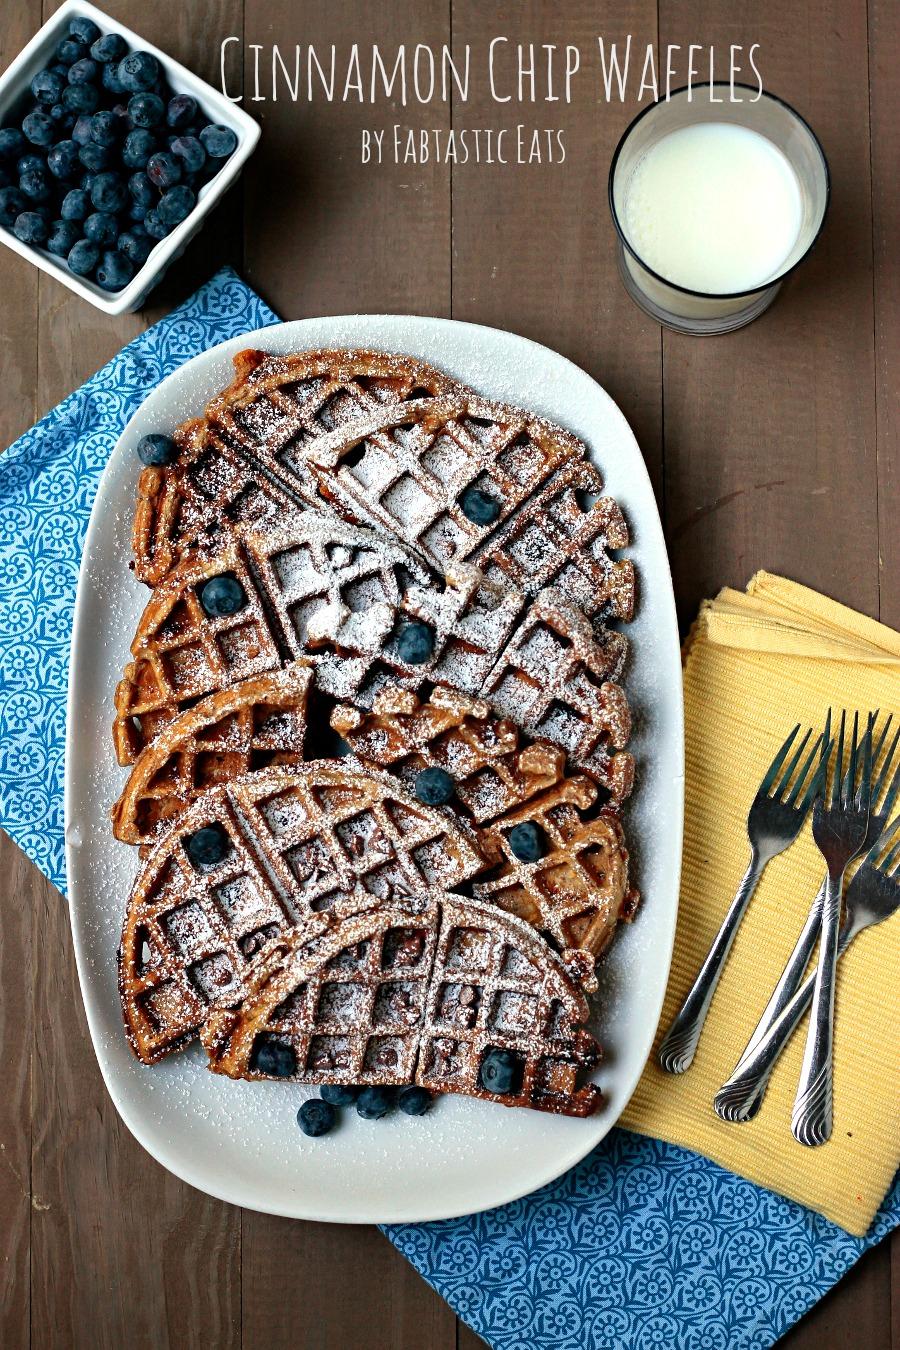 Cinnamon Chip Waffles